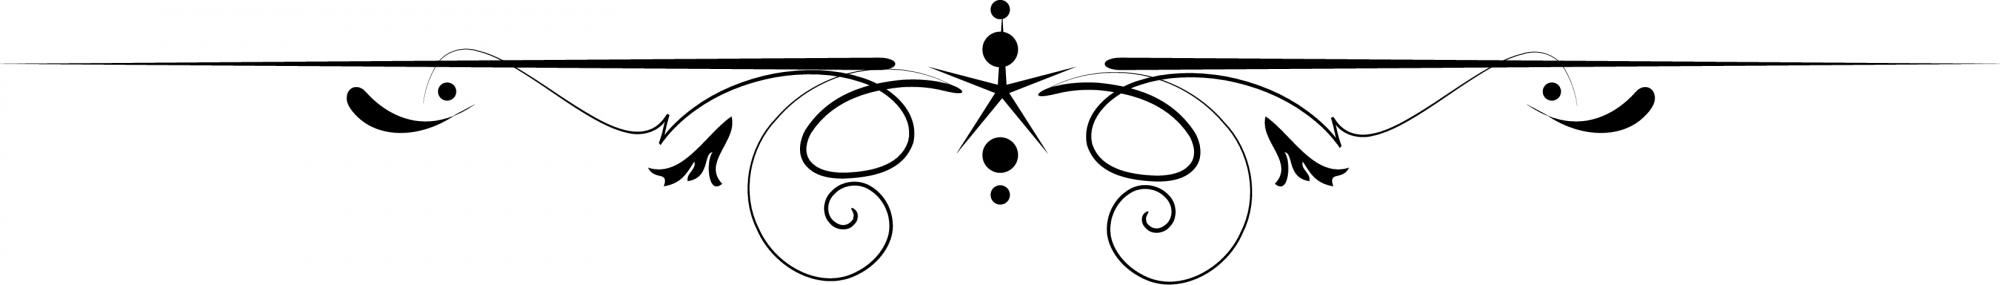 Free Decorative Line Clipart, Download Free Clip Art, Free.